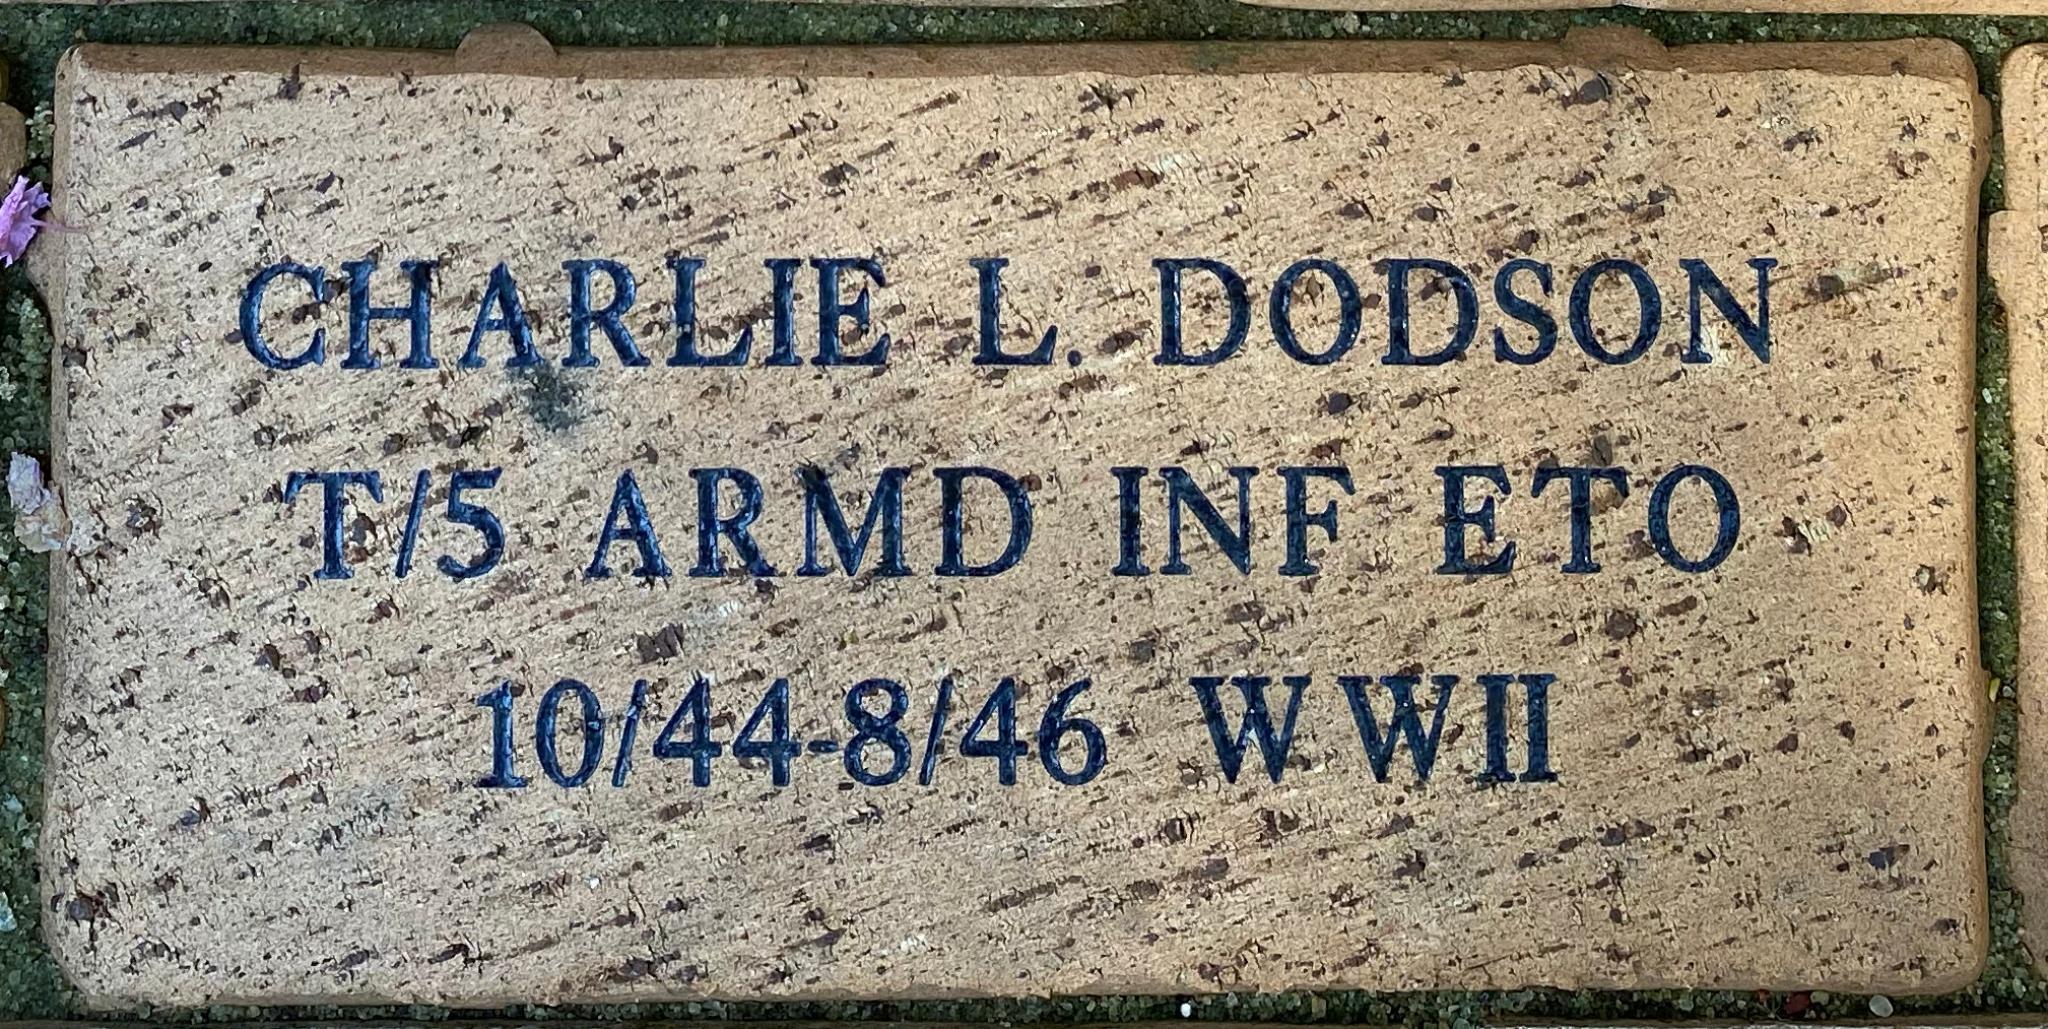 CHARLIE LEE DODSON T/5 ARMD INF ETO 10/44-8/46 WWII